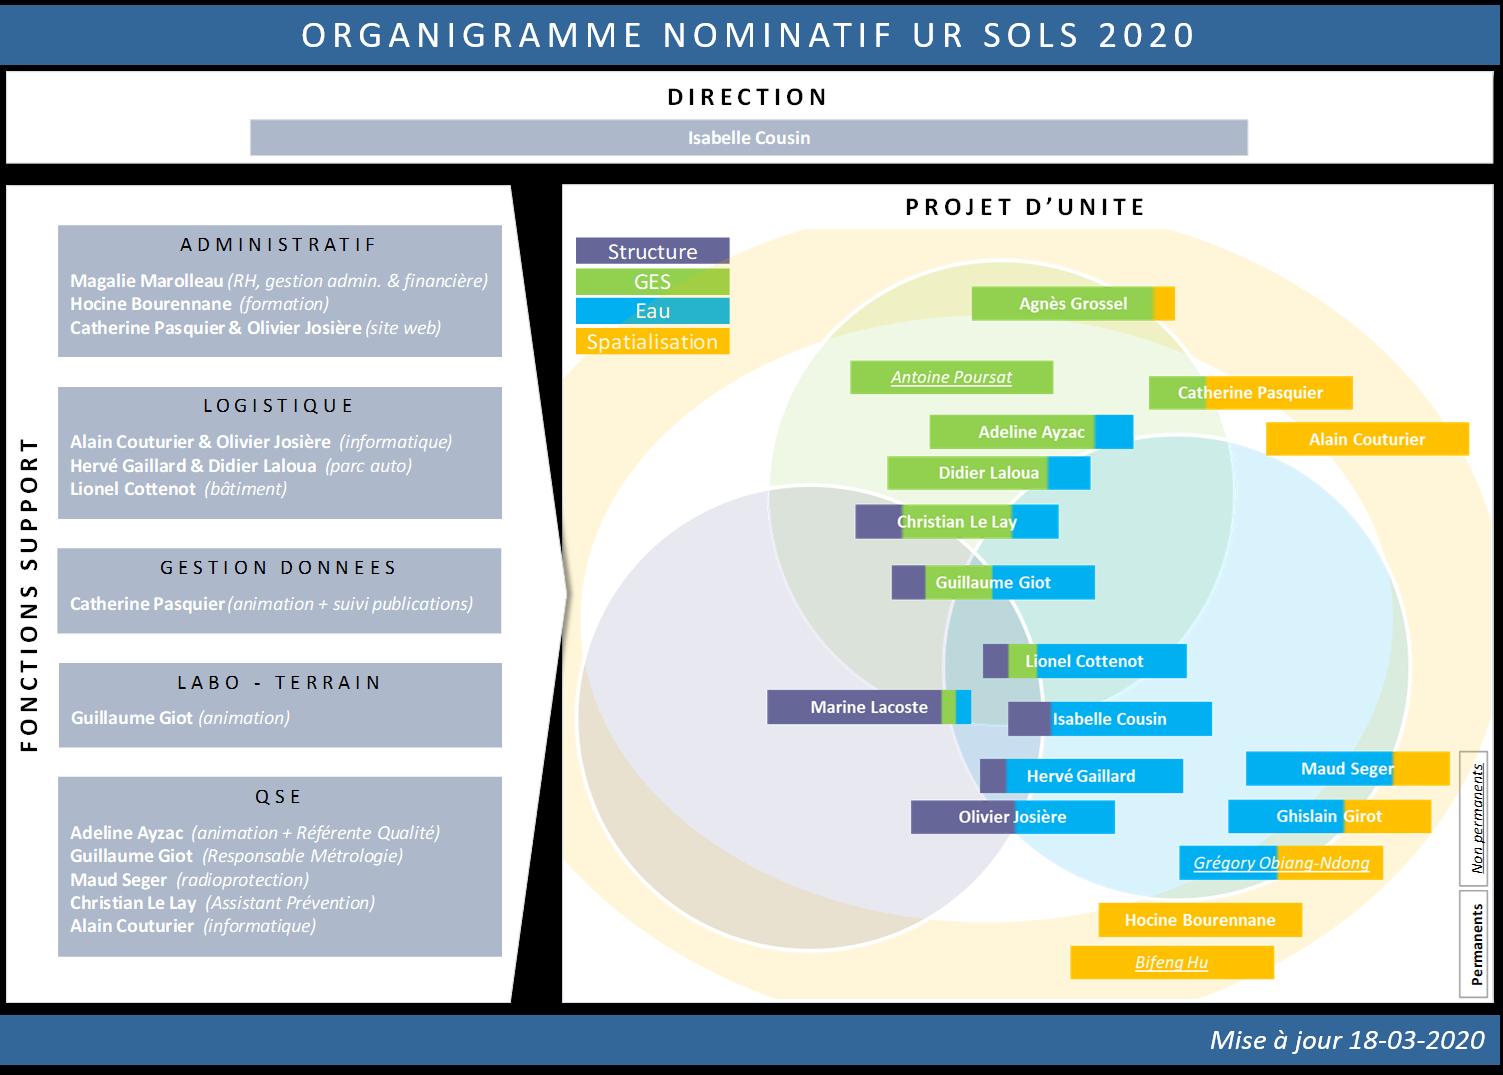 Organigramme nominatif 2020